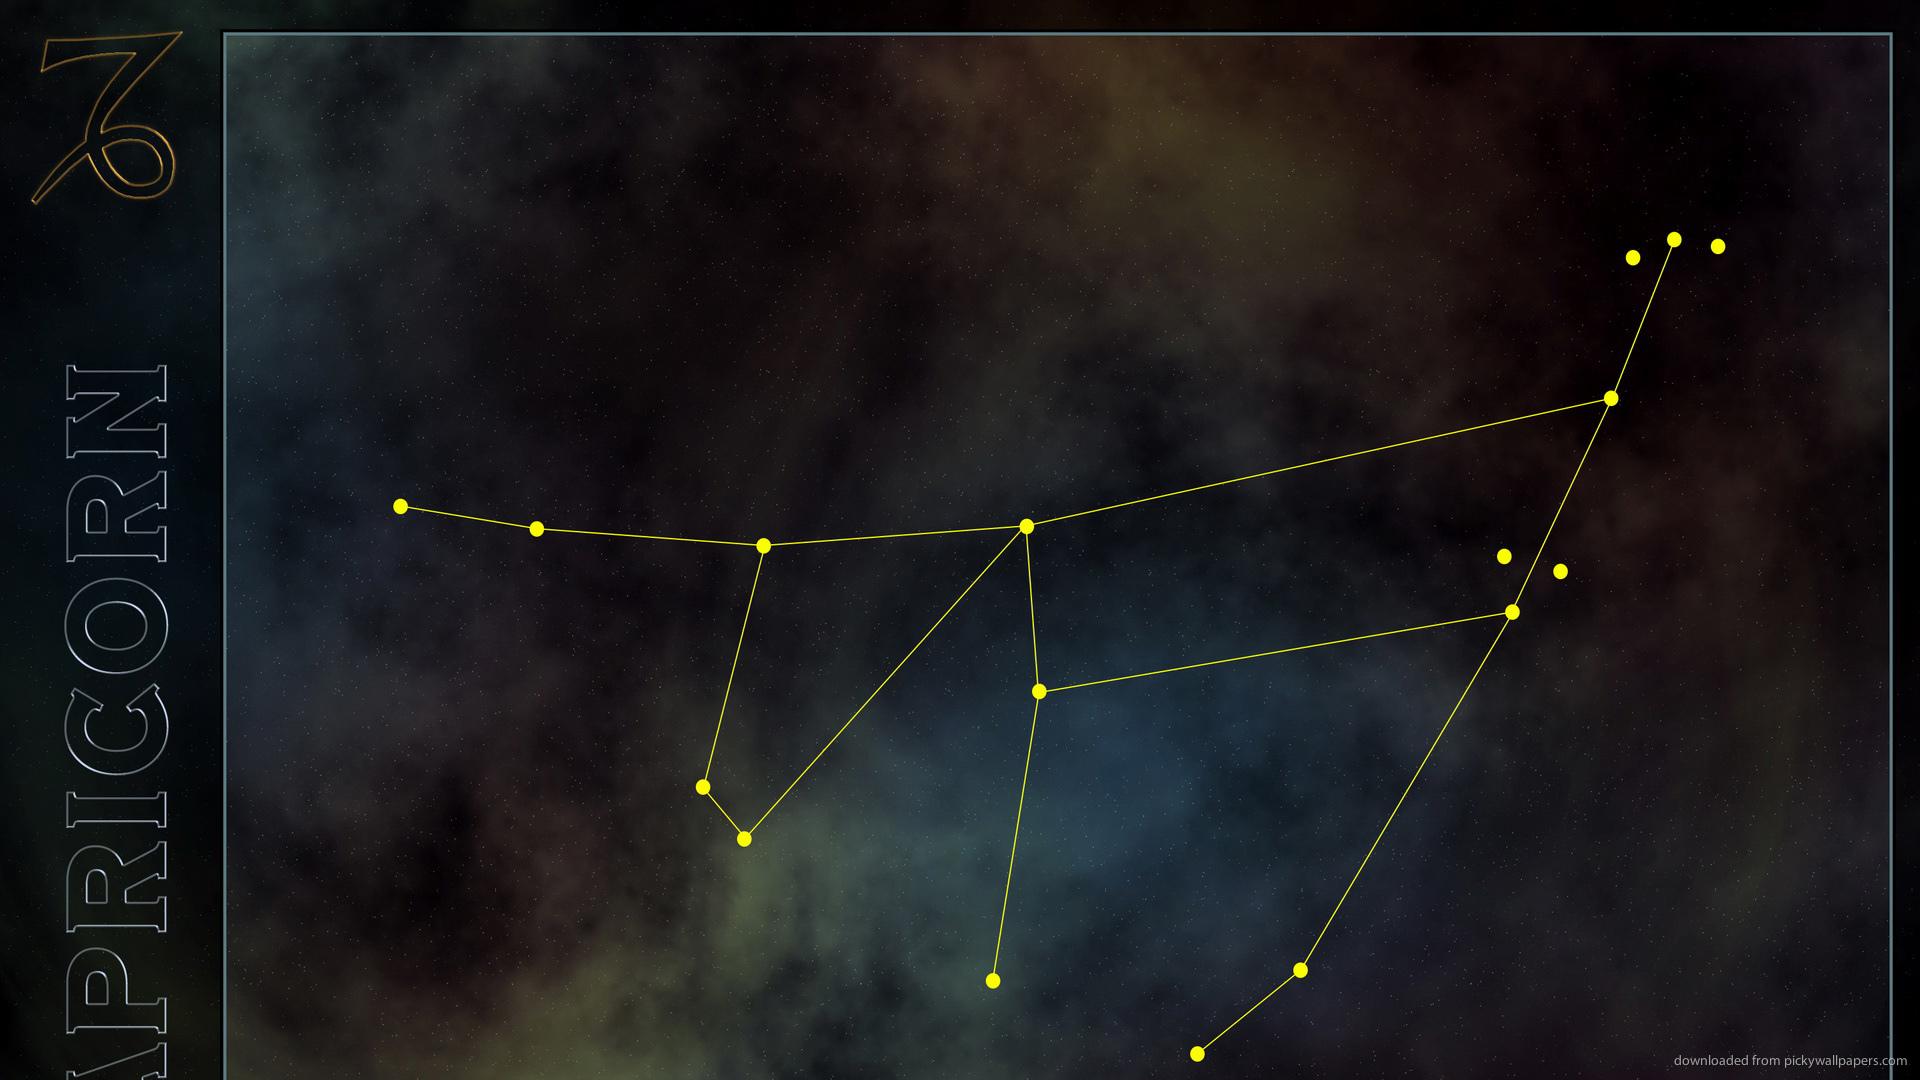 HD Capricorn Constellation Wallpaper 1920x1080